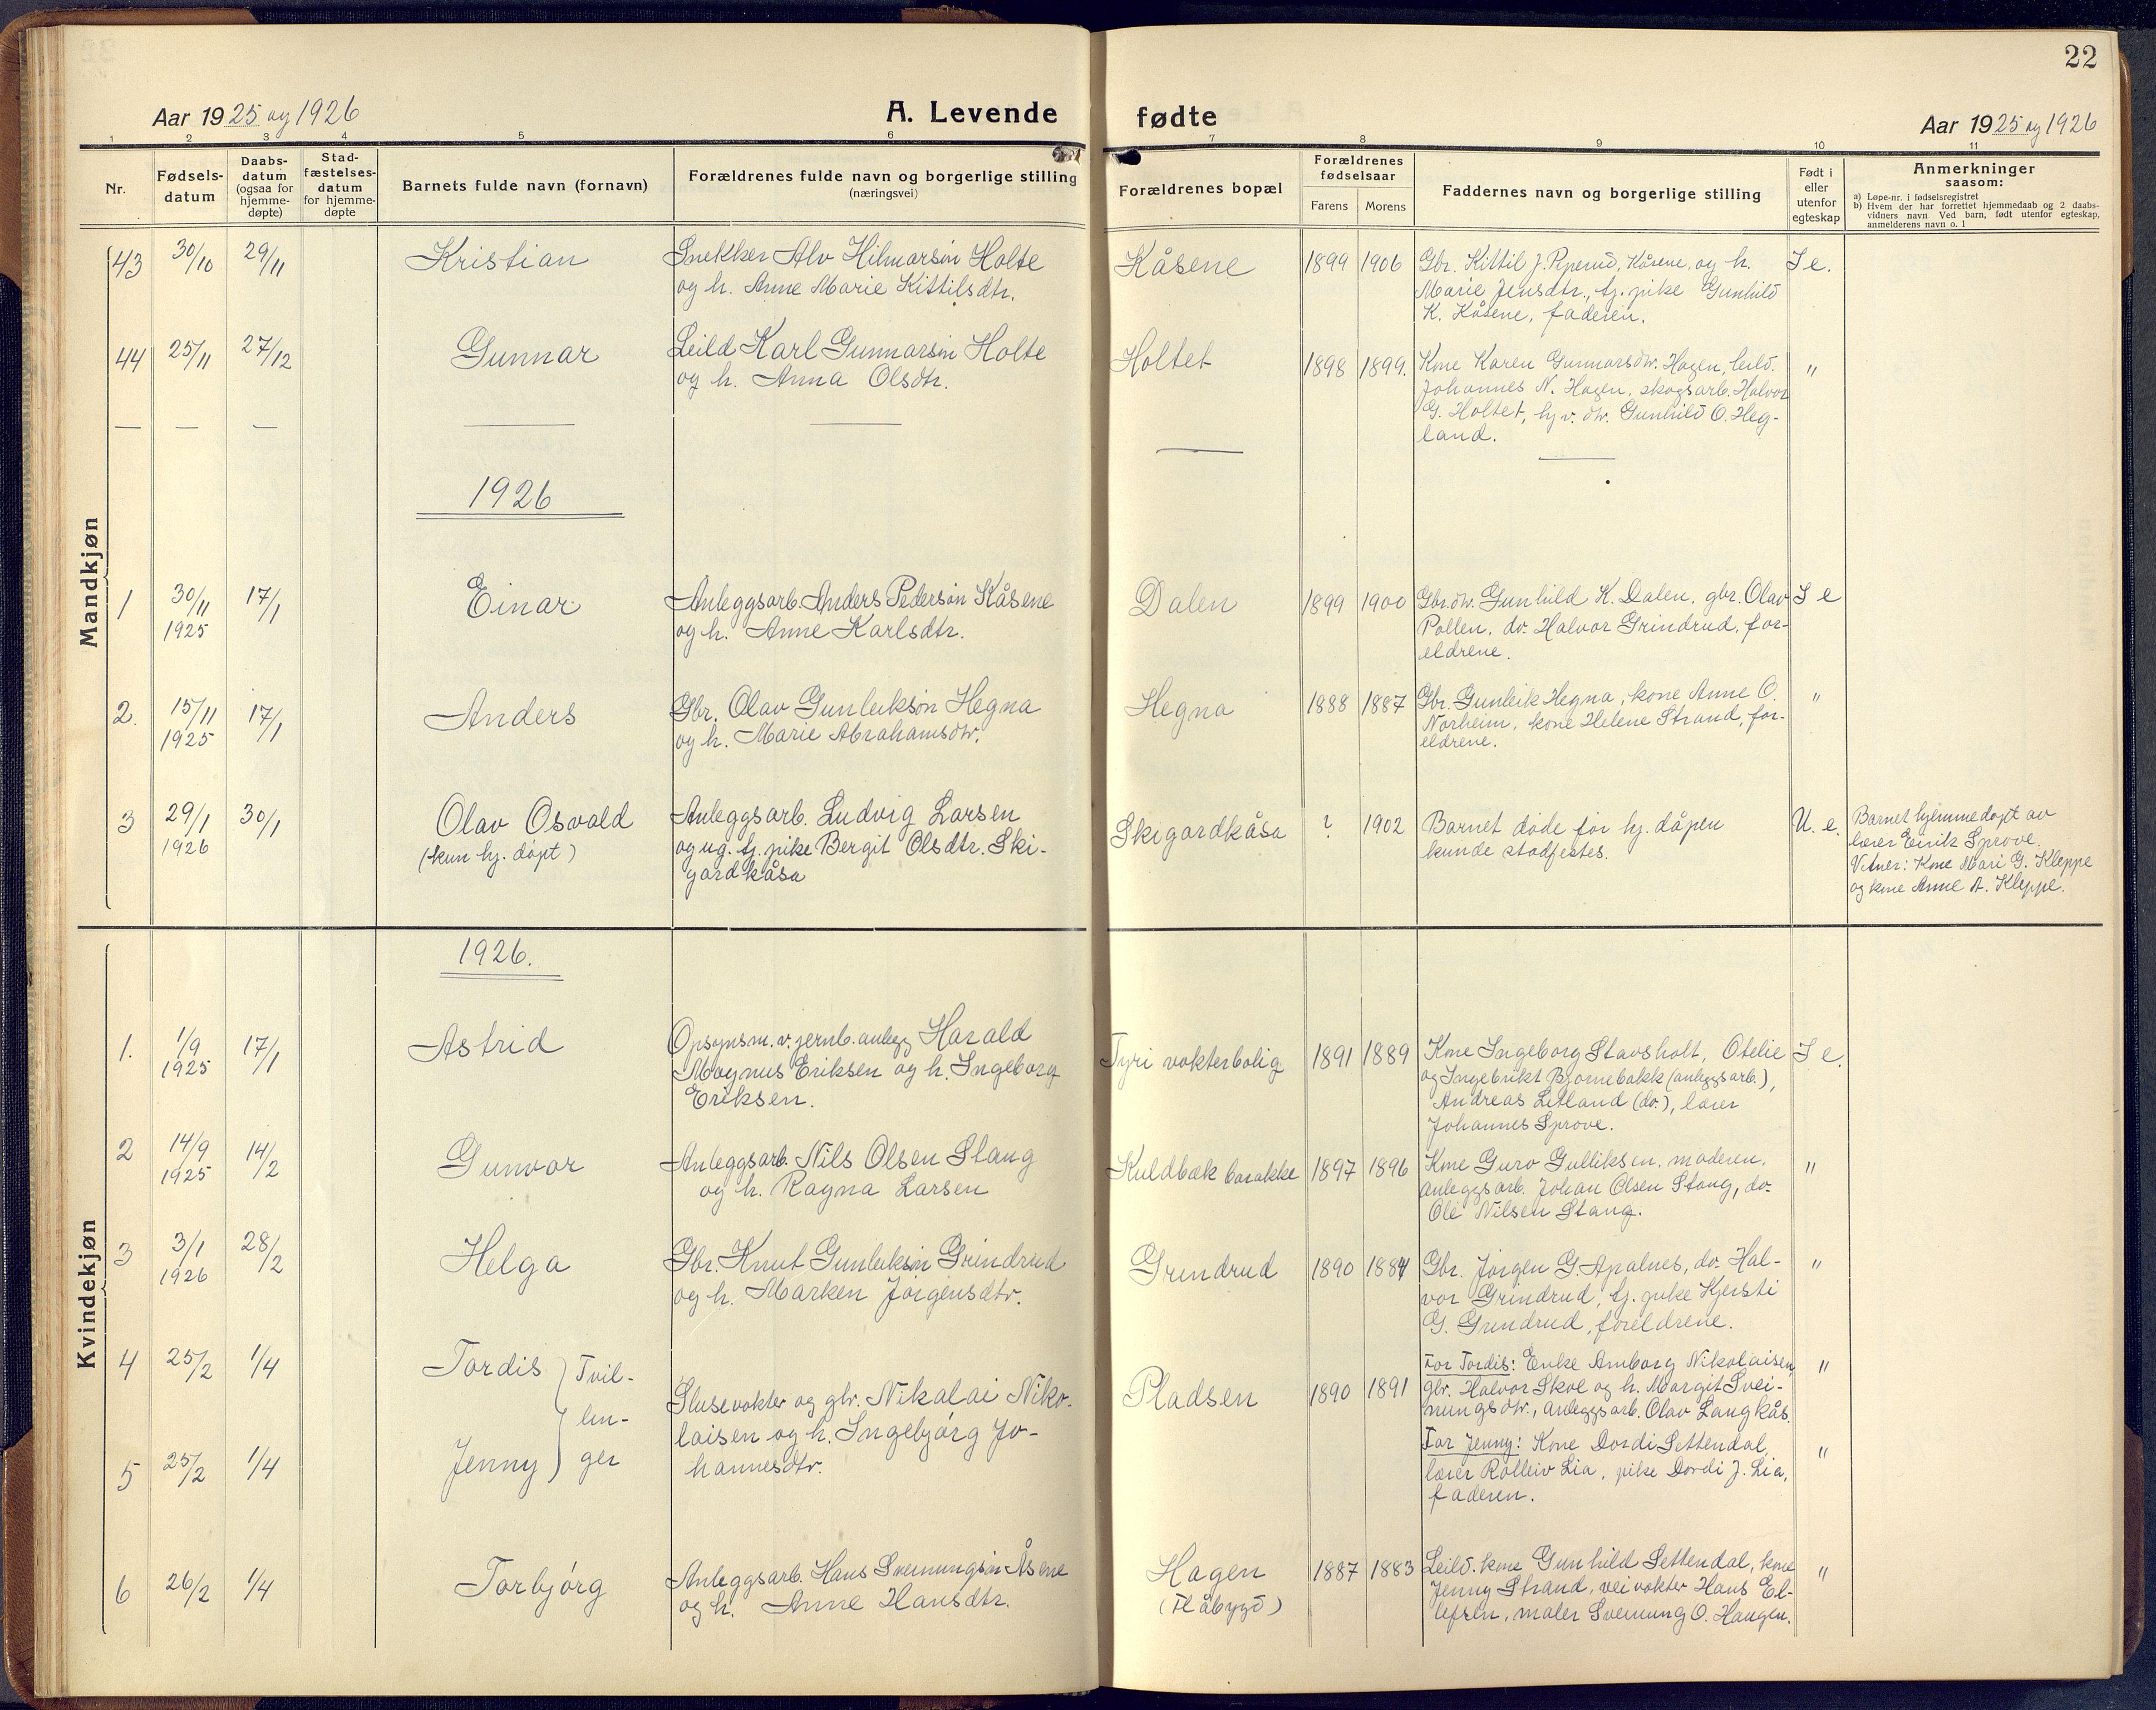 SAKO, Lunde kirkebøker, F/Fa/L0006: Ministerialbok nr. I 6, 1922-1940, s. 22